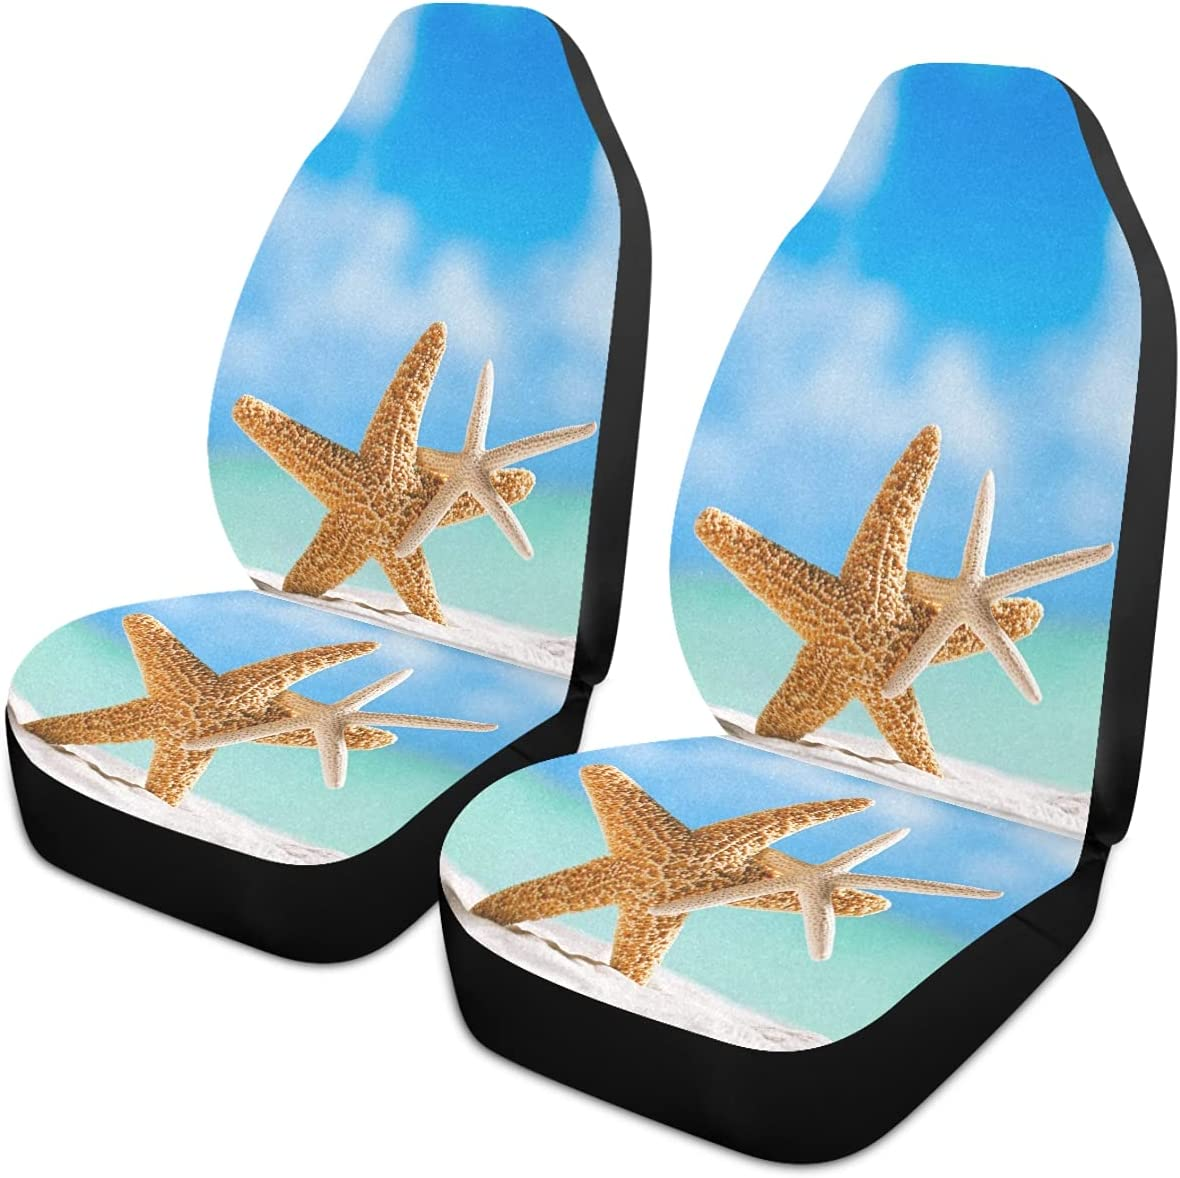 Oarencol Summer Starfish Beach Ranking TOP4 Sandy Universal Car Columbus Mall Covers Seat A